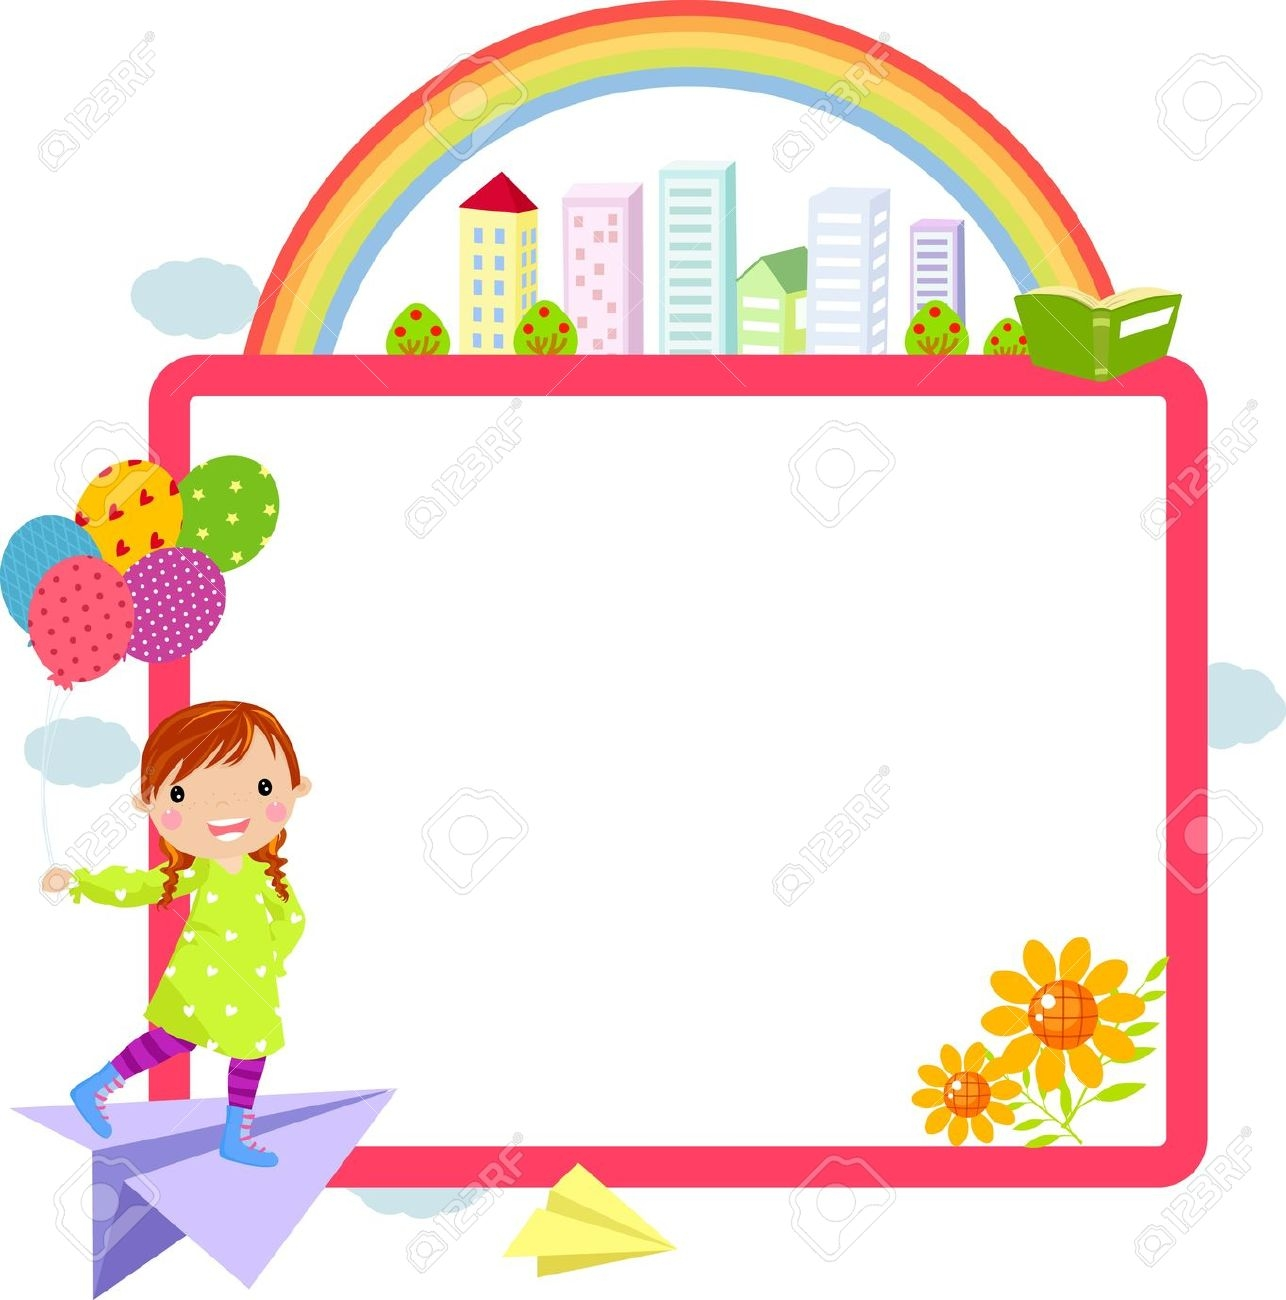 hight resolution of rainbow border clipart free download best rainbow border teacher apple clip art cute teacher clipart